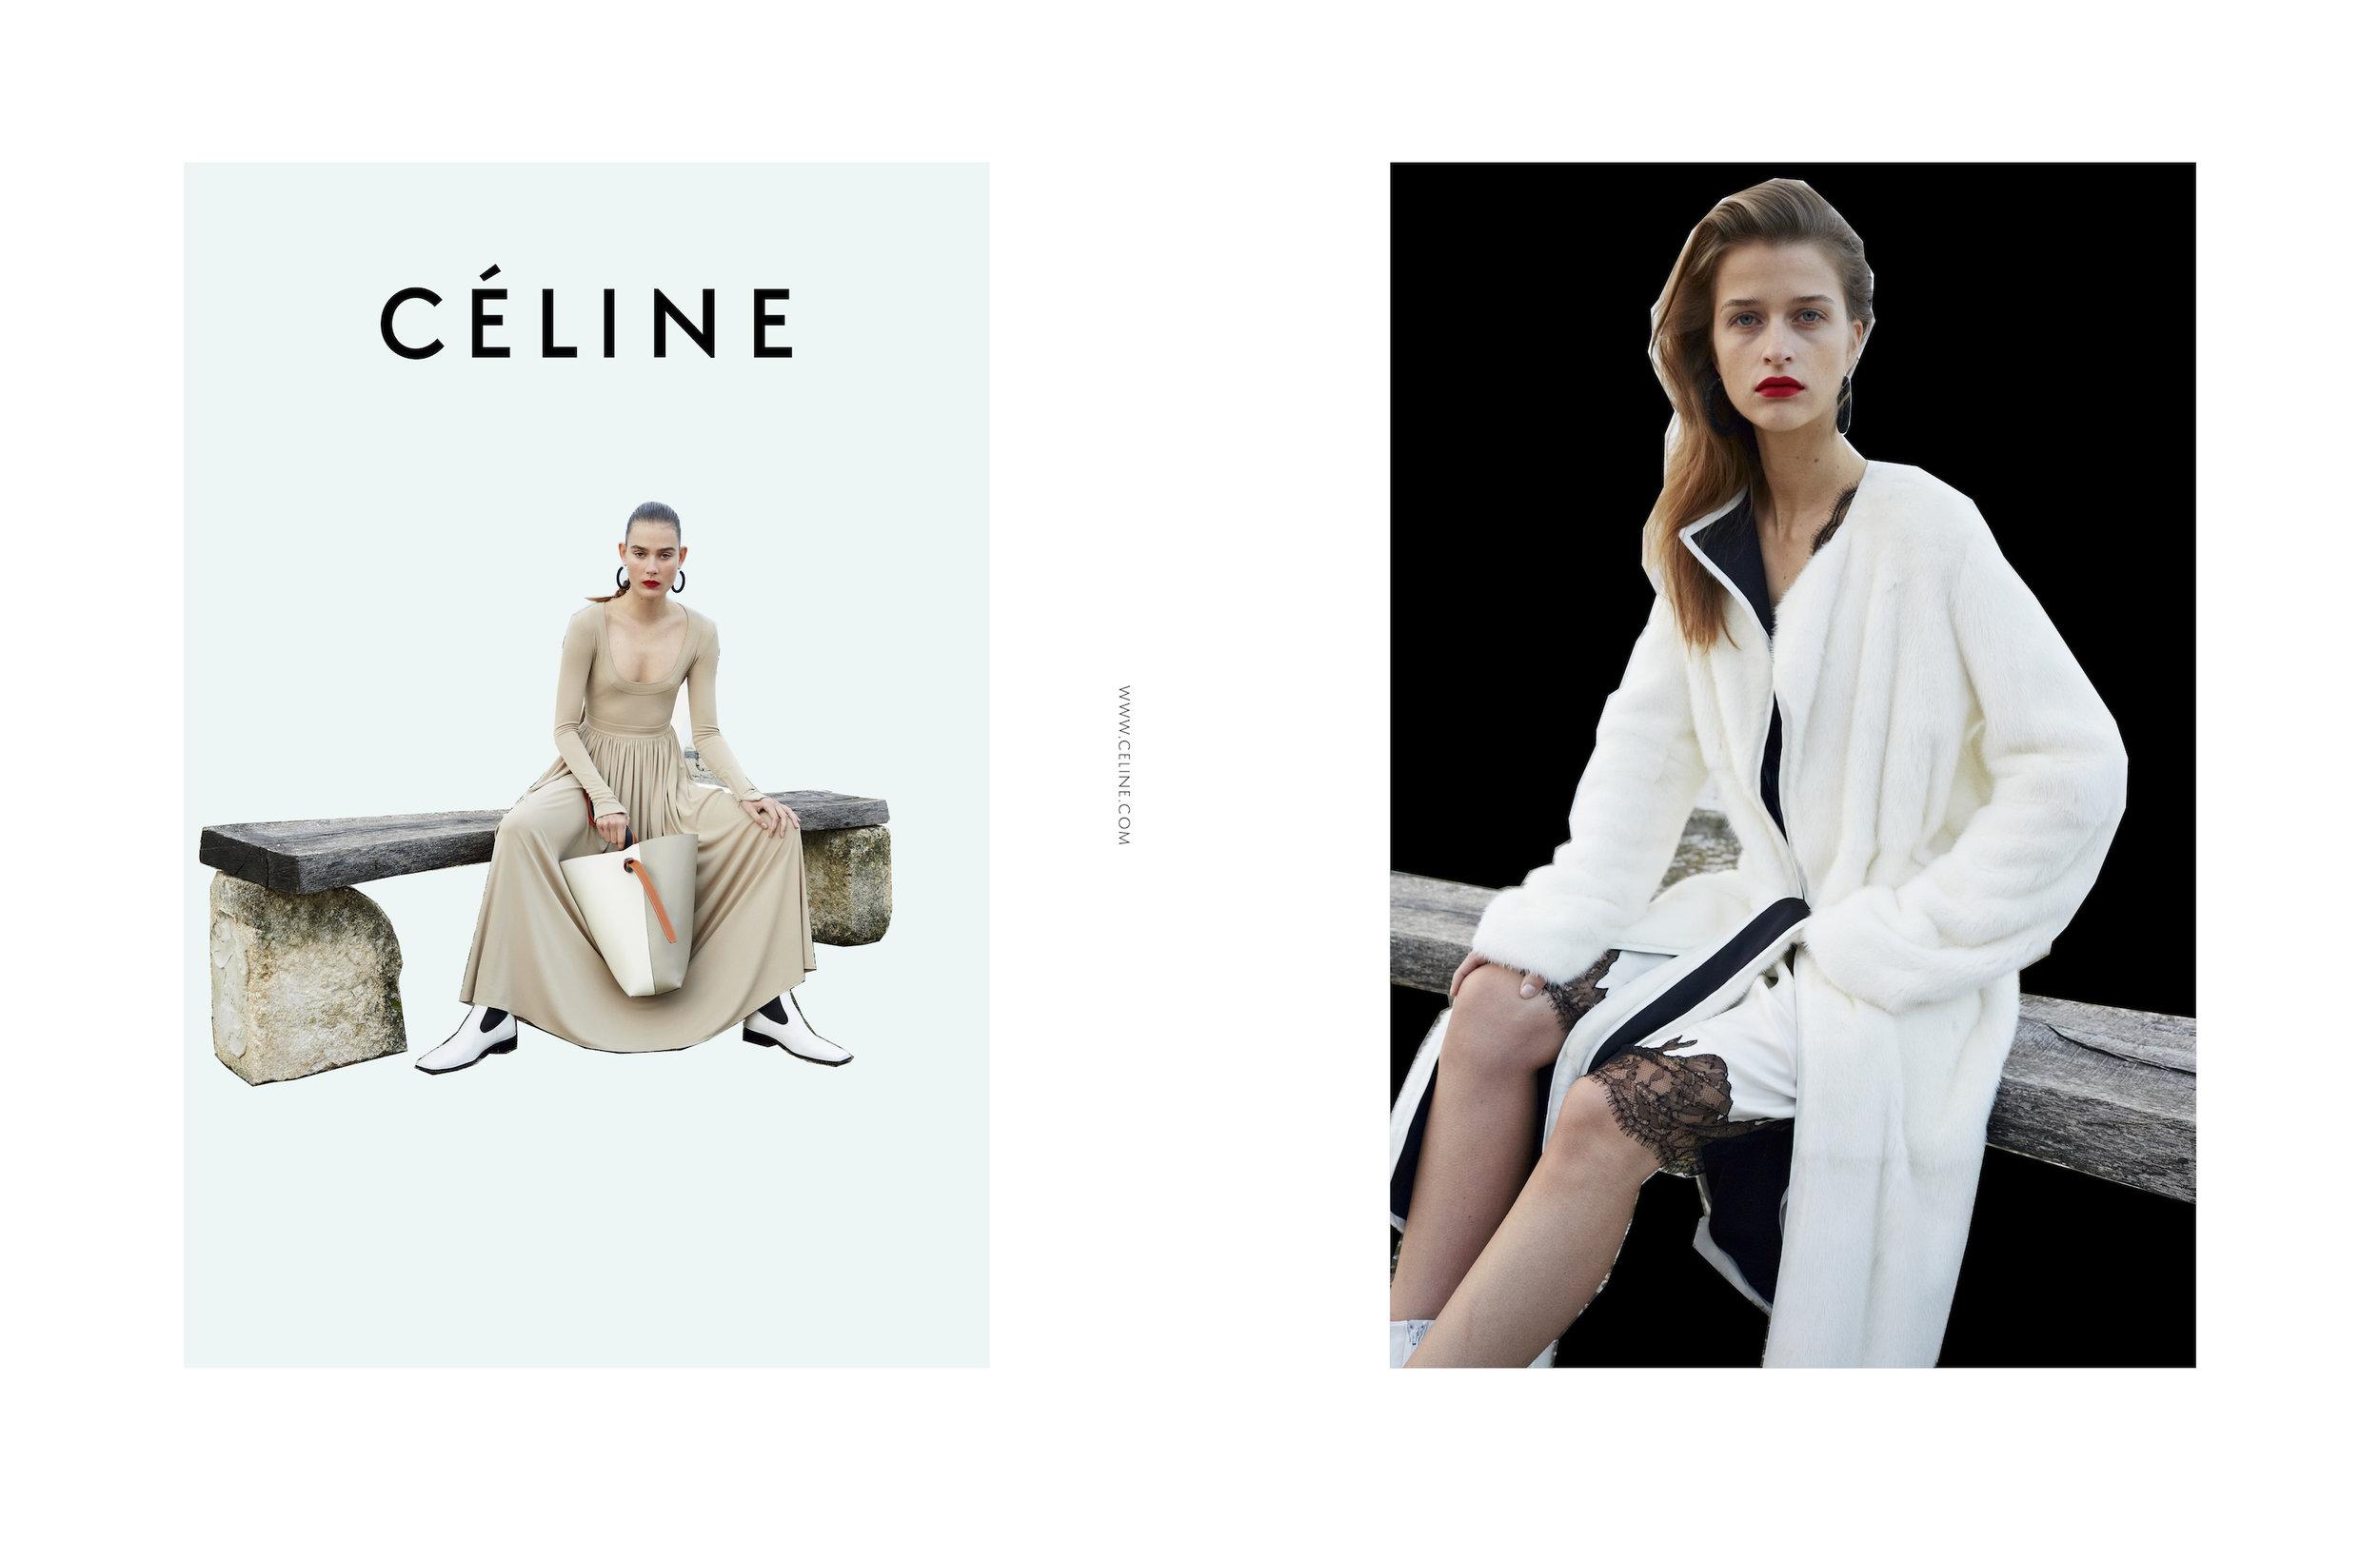 celine-ss2016-campaign-01.jpg